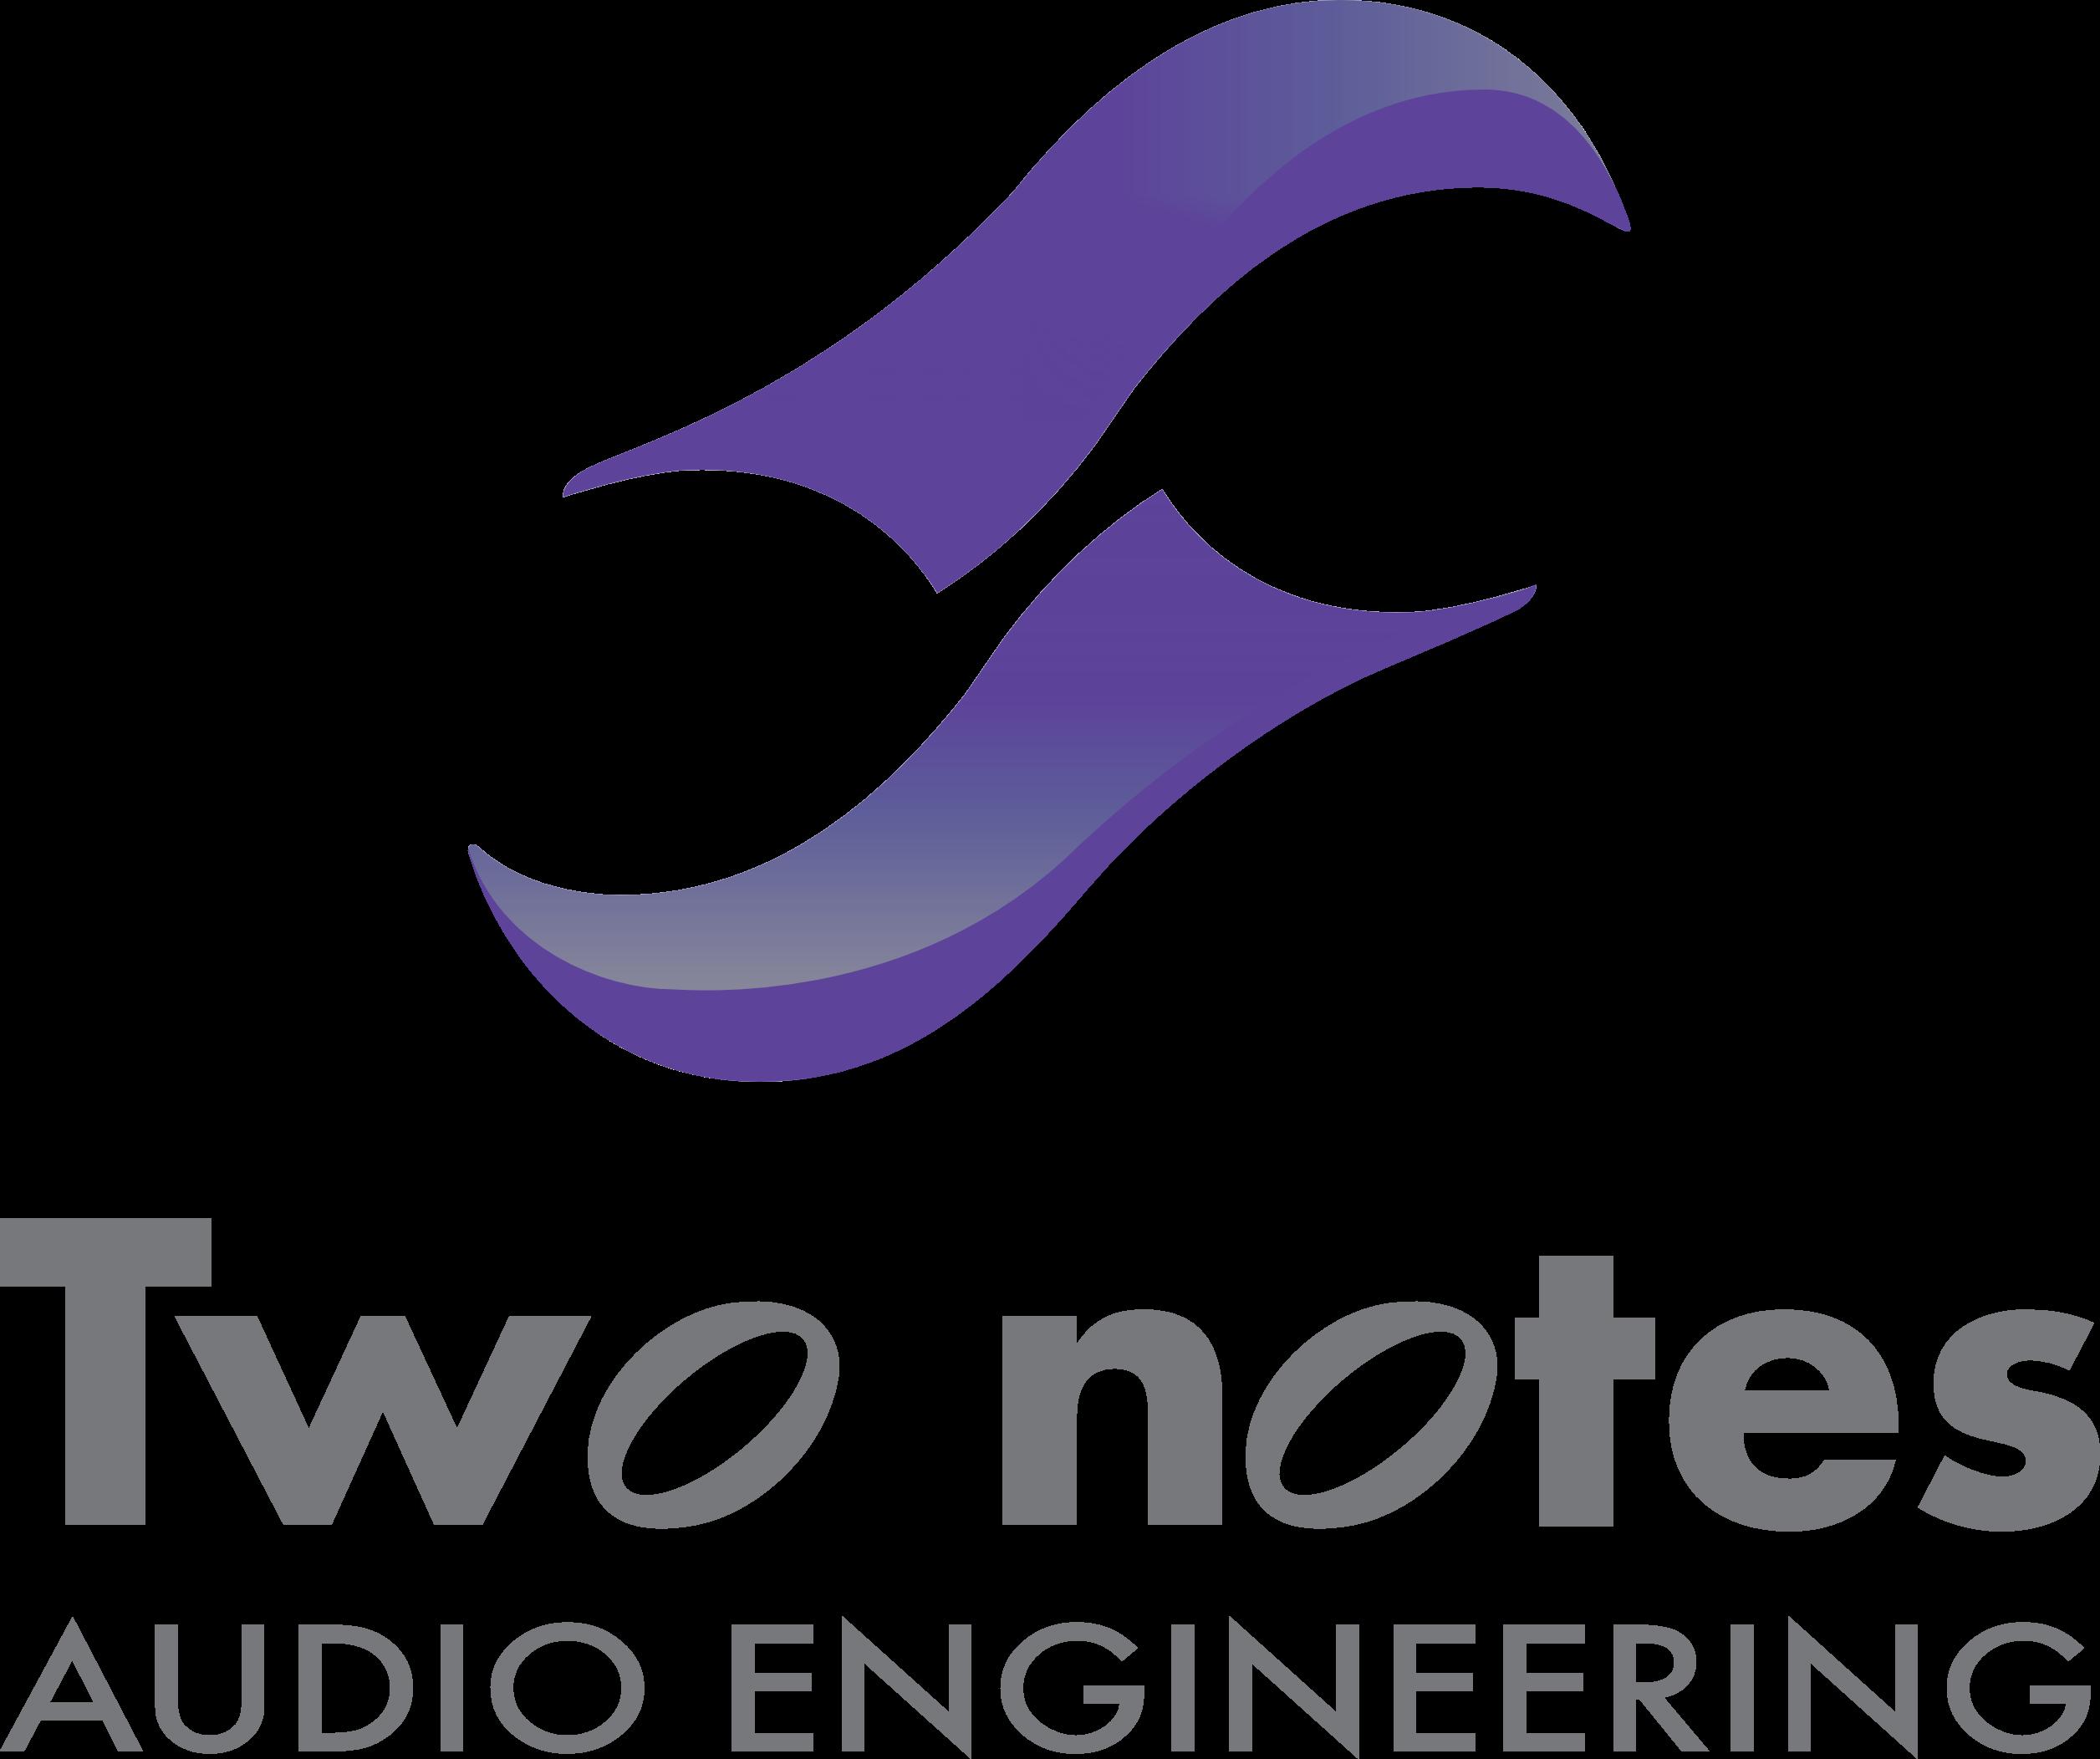 two-notes-partner-color-transparent.png